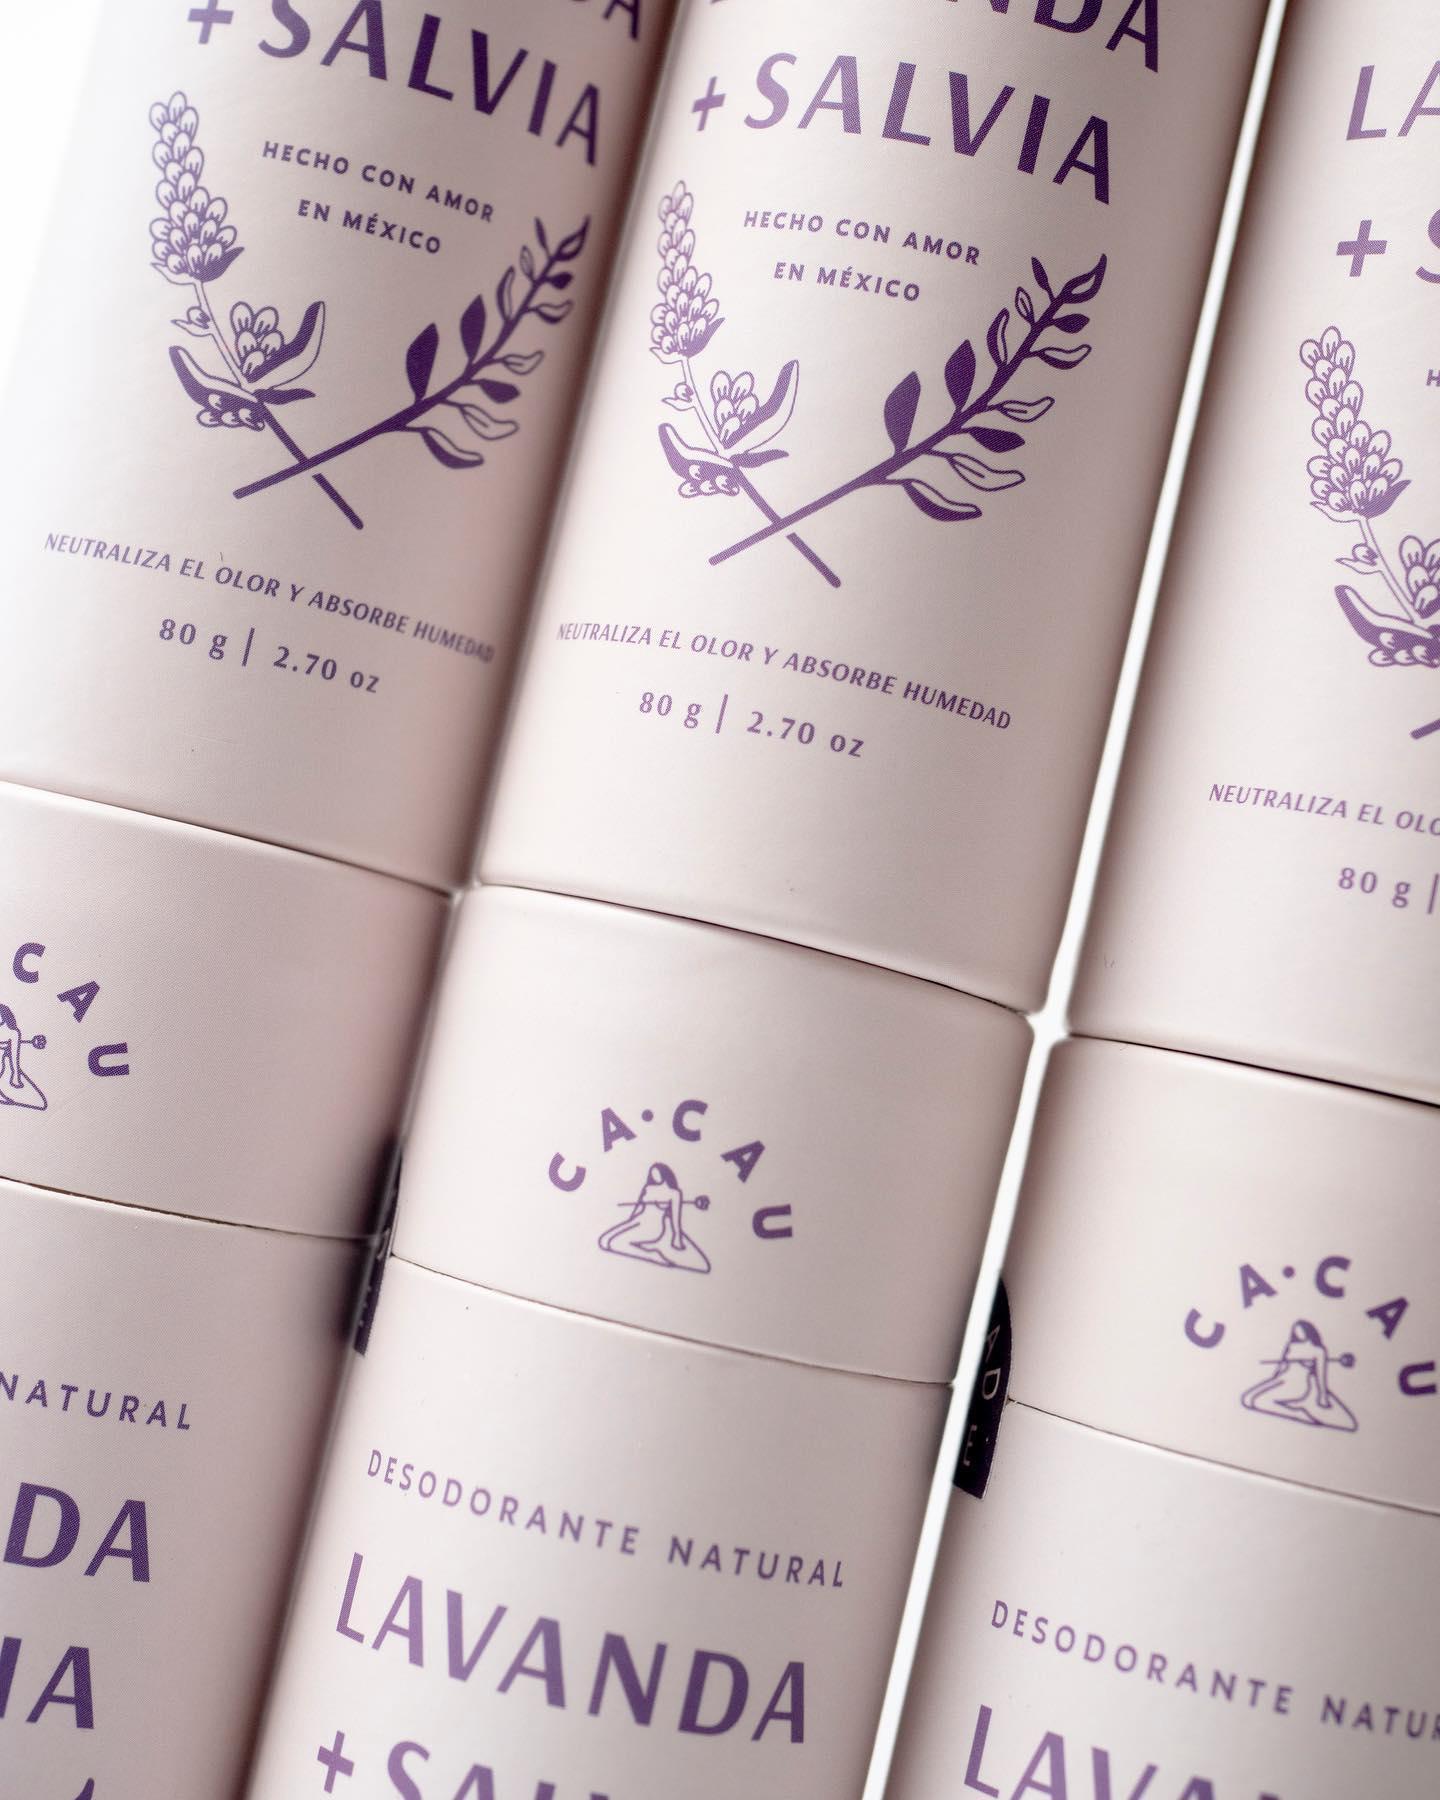 Cacau-Zeki-Michael-Design-Vegan-Packaging-sustainable-desodorante-natural